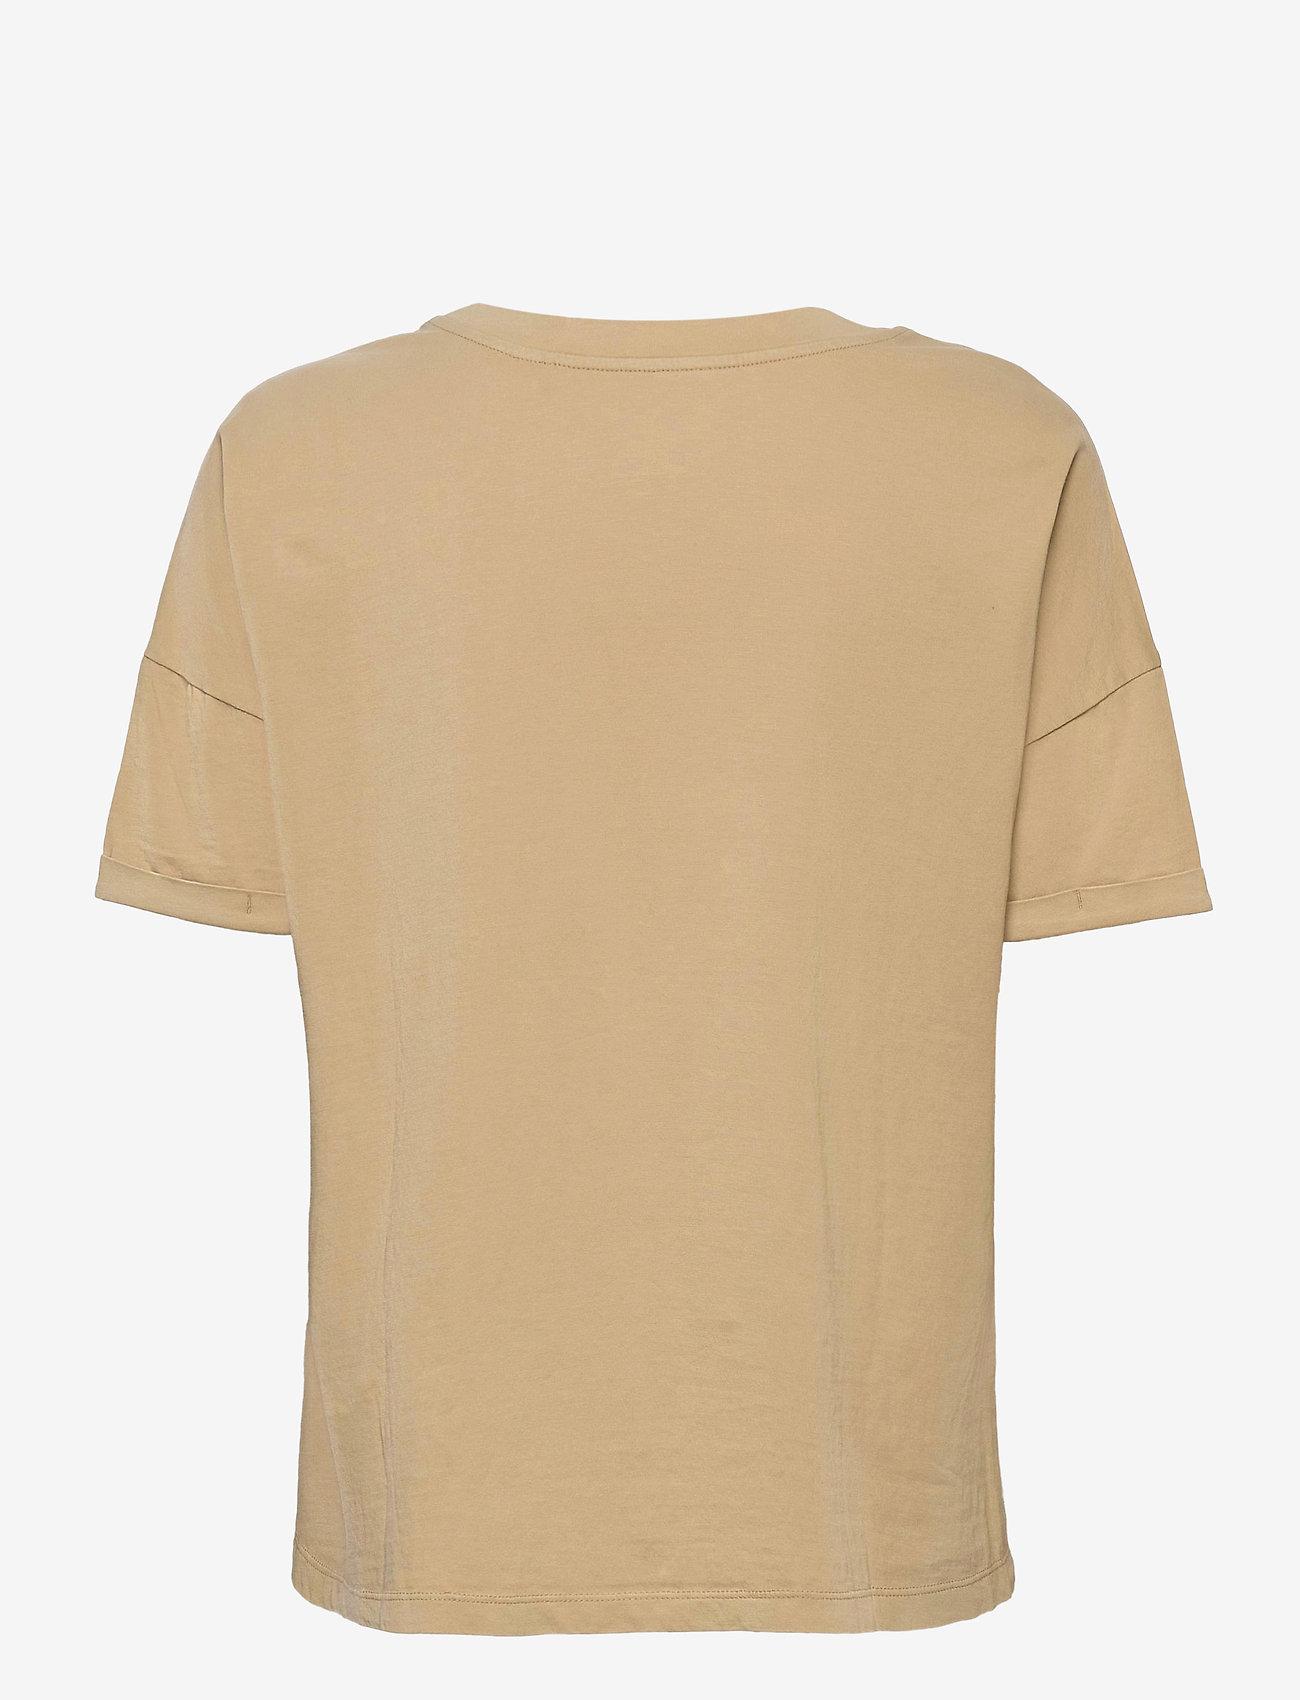 Esprit Casual - T-Shirts - t-shirts - beige - 1